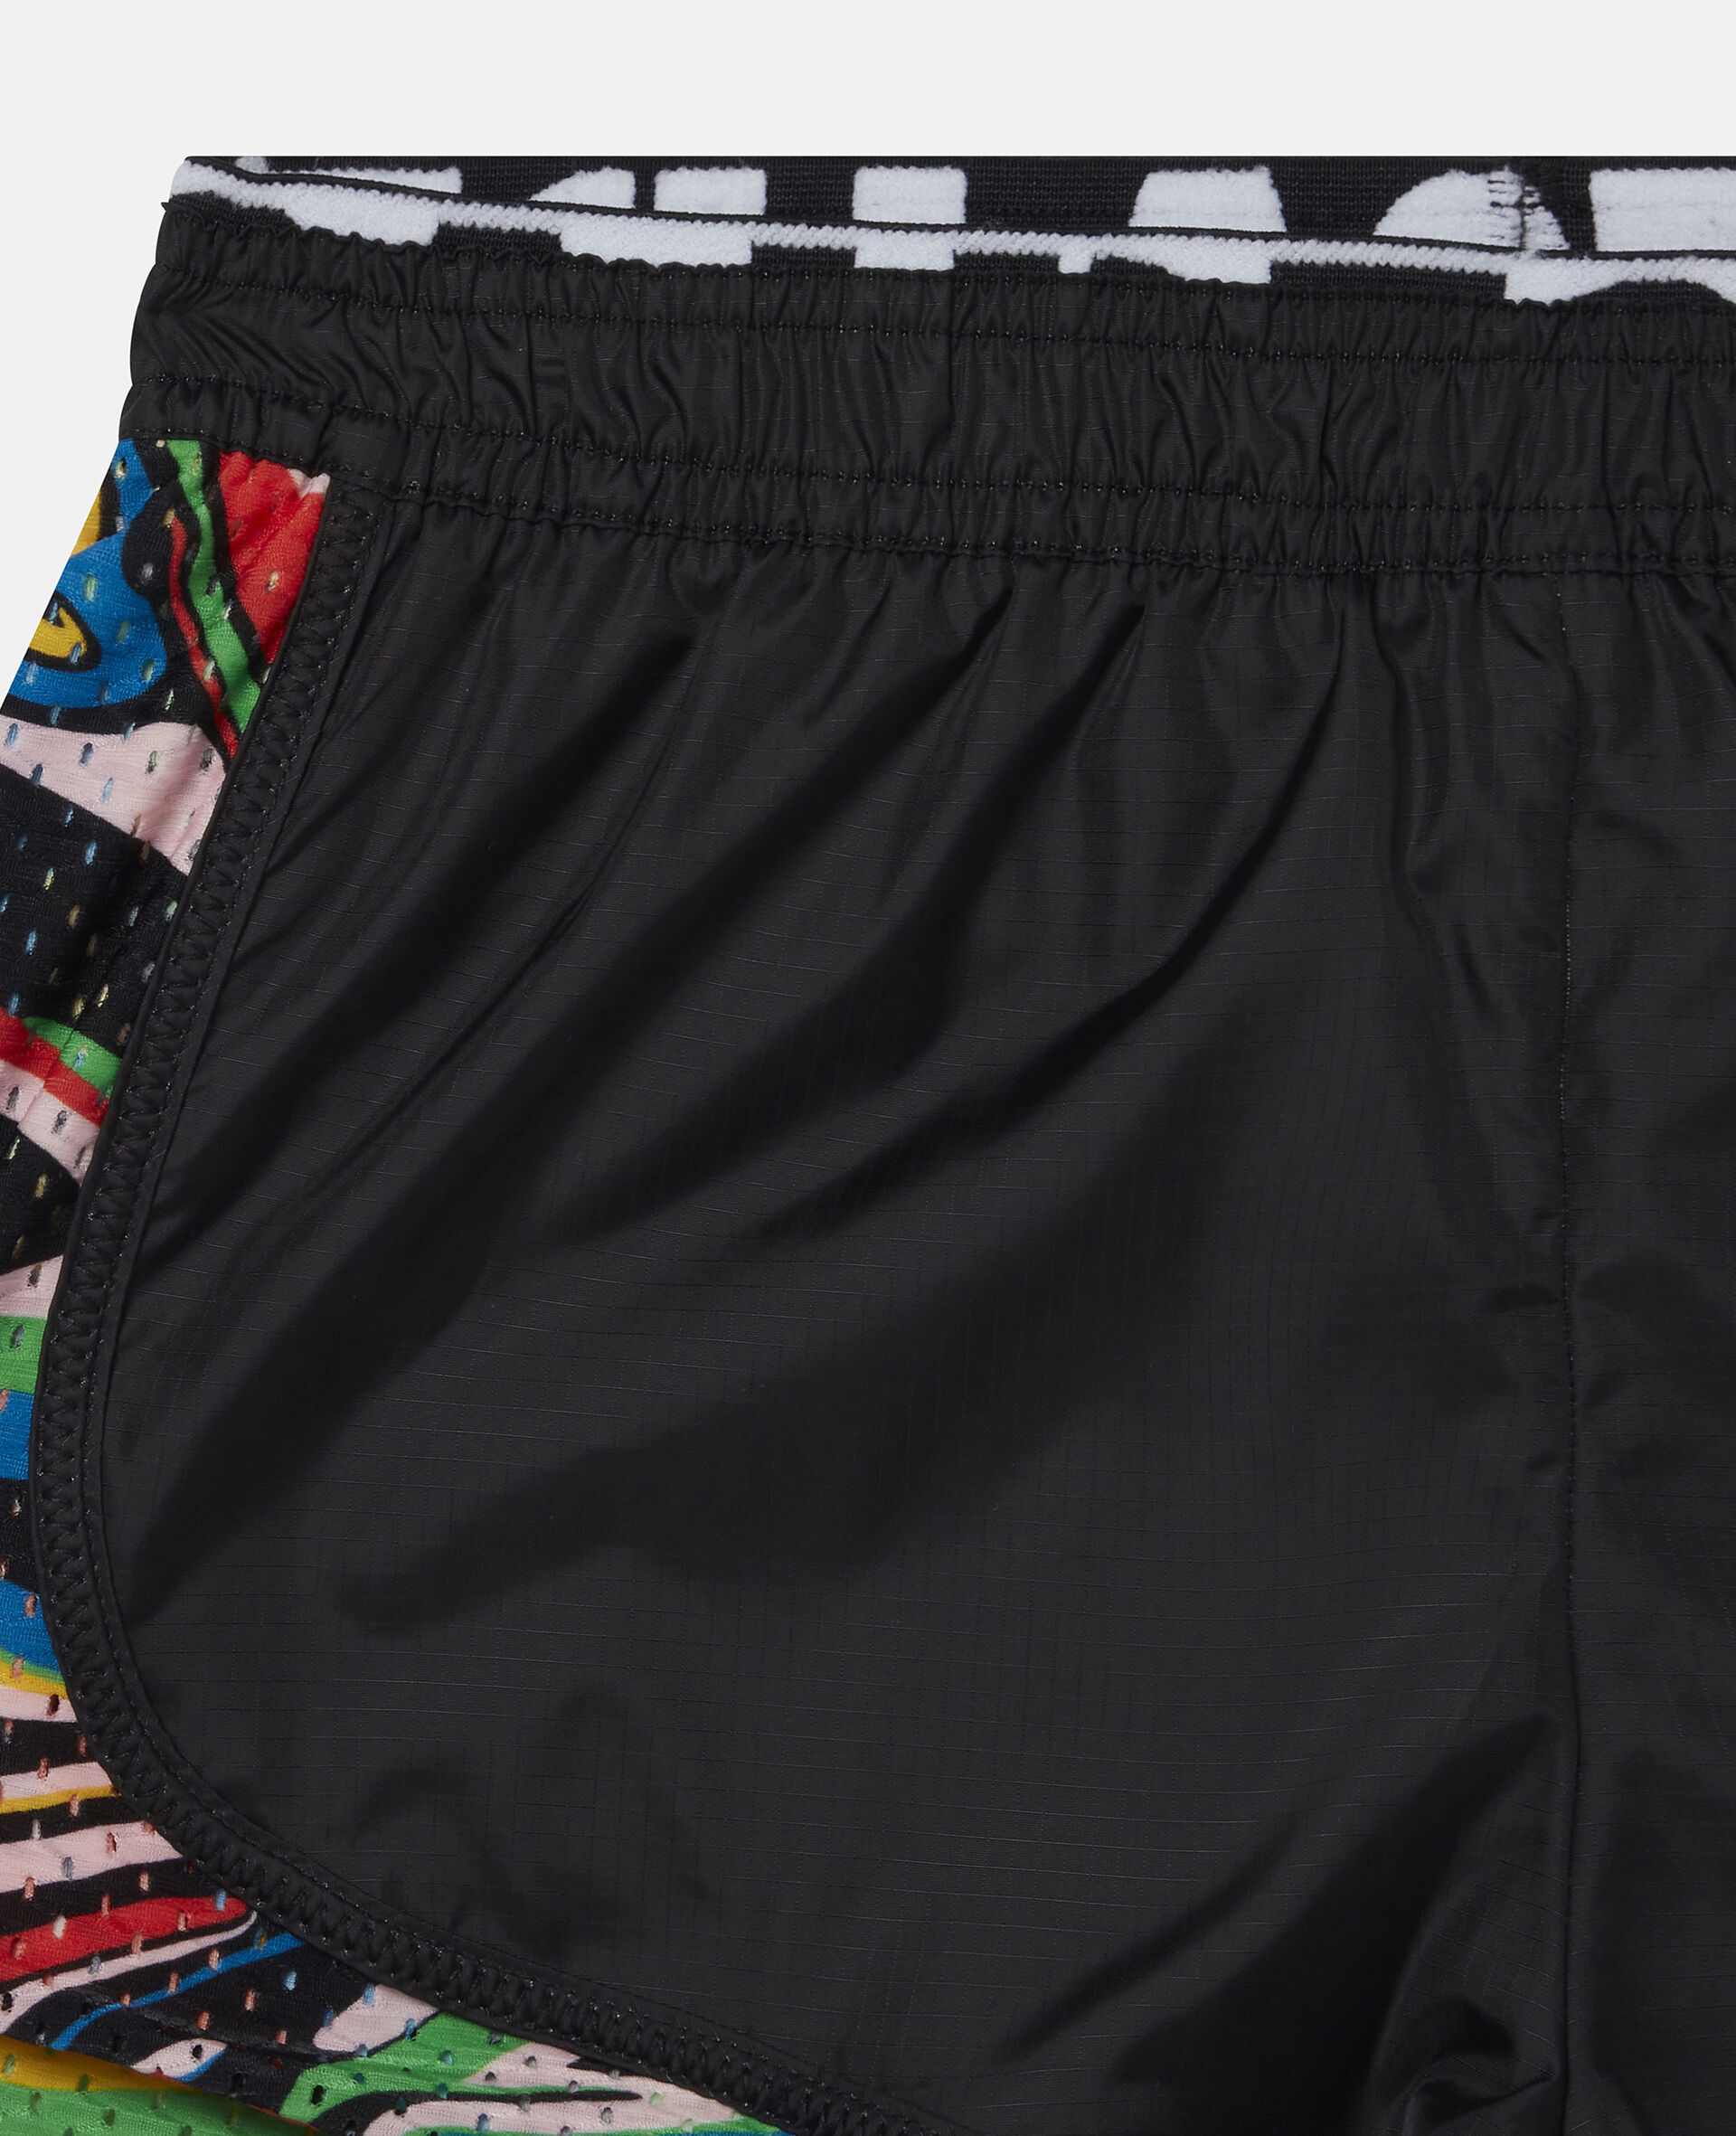 大理石纹印花运动短裤 -黑色-large image number 1